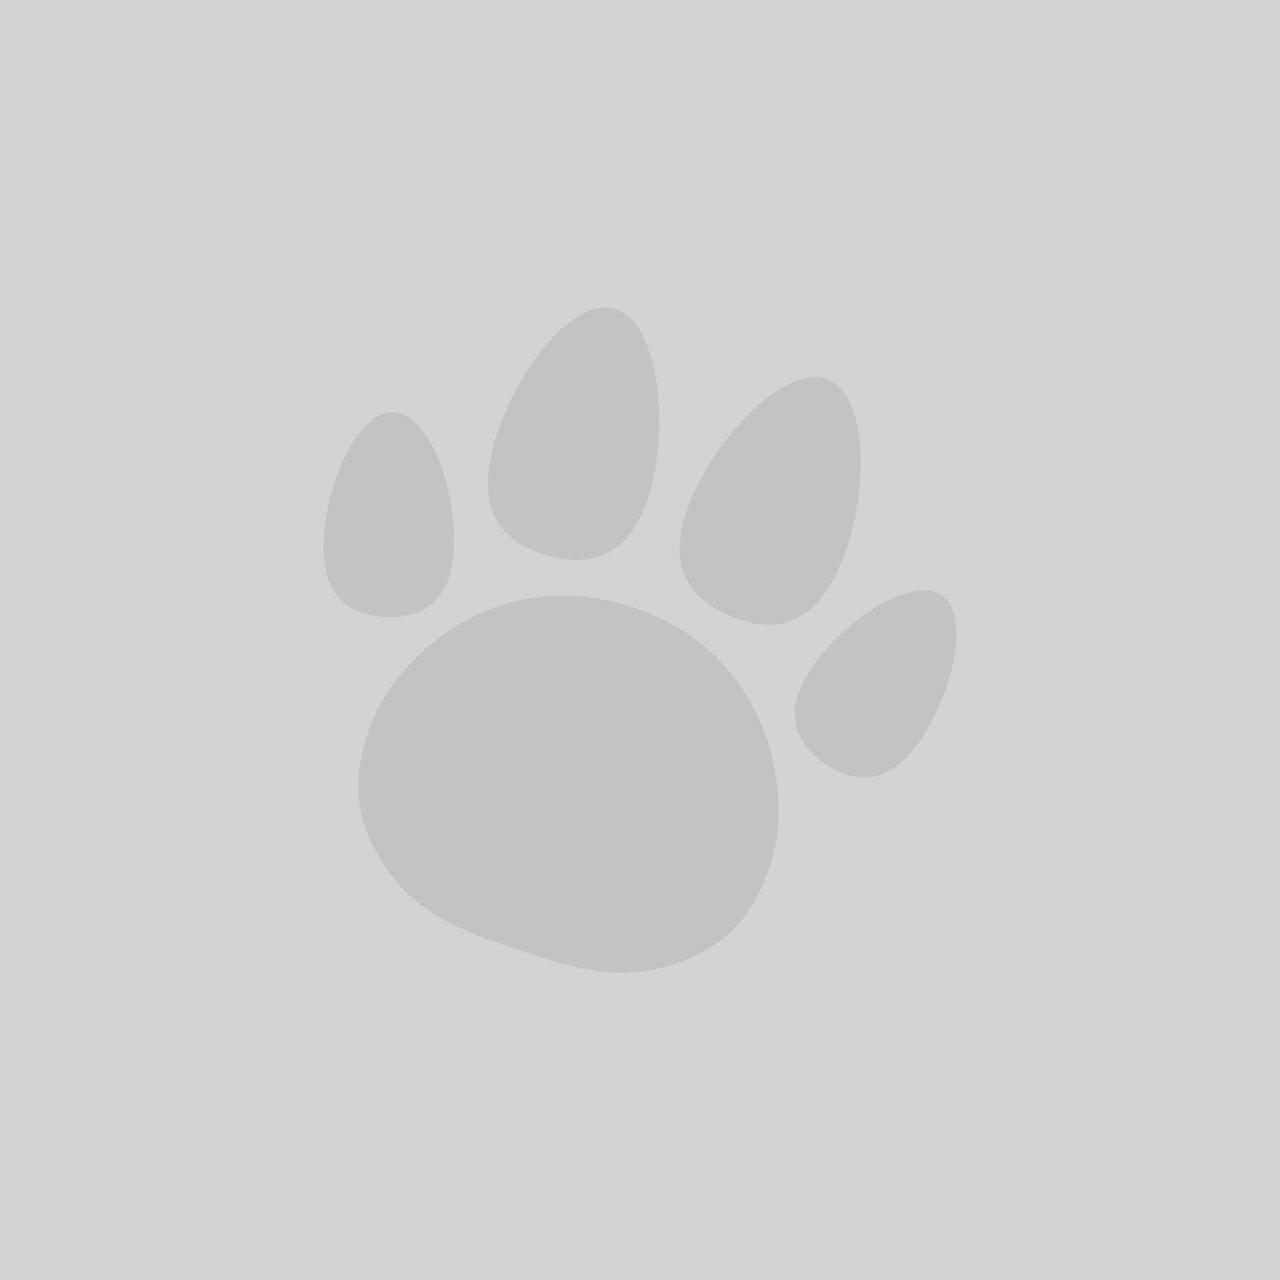 Dog Mate Electromagnetic Dog Door White